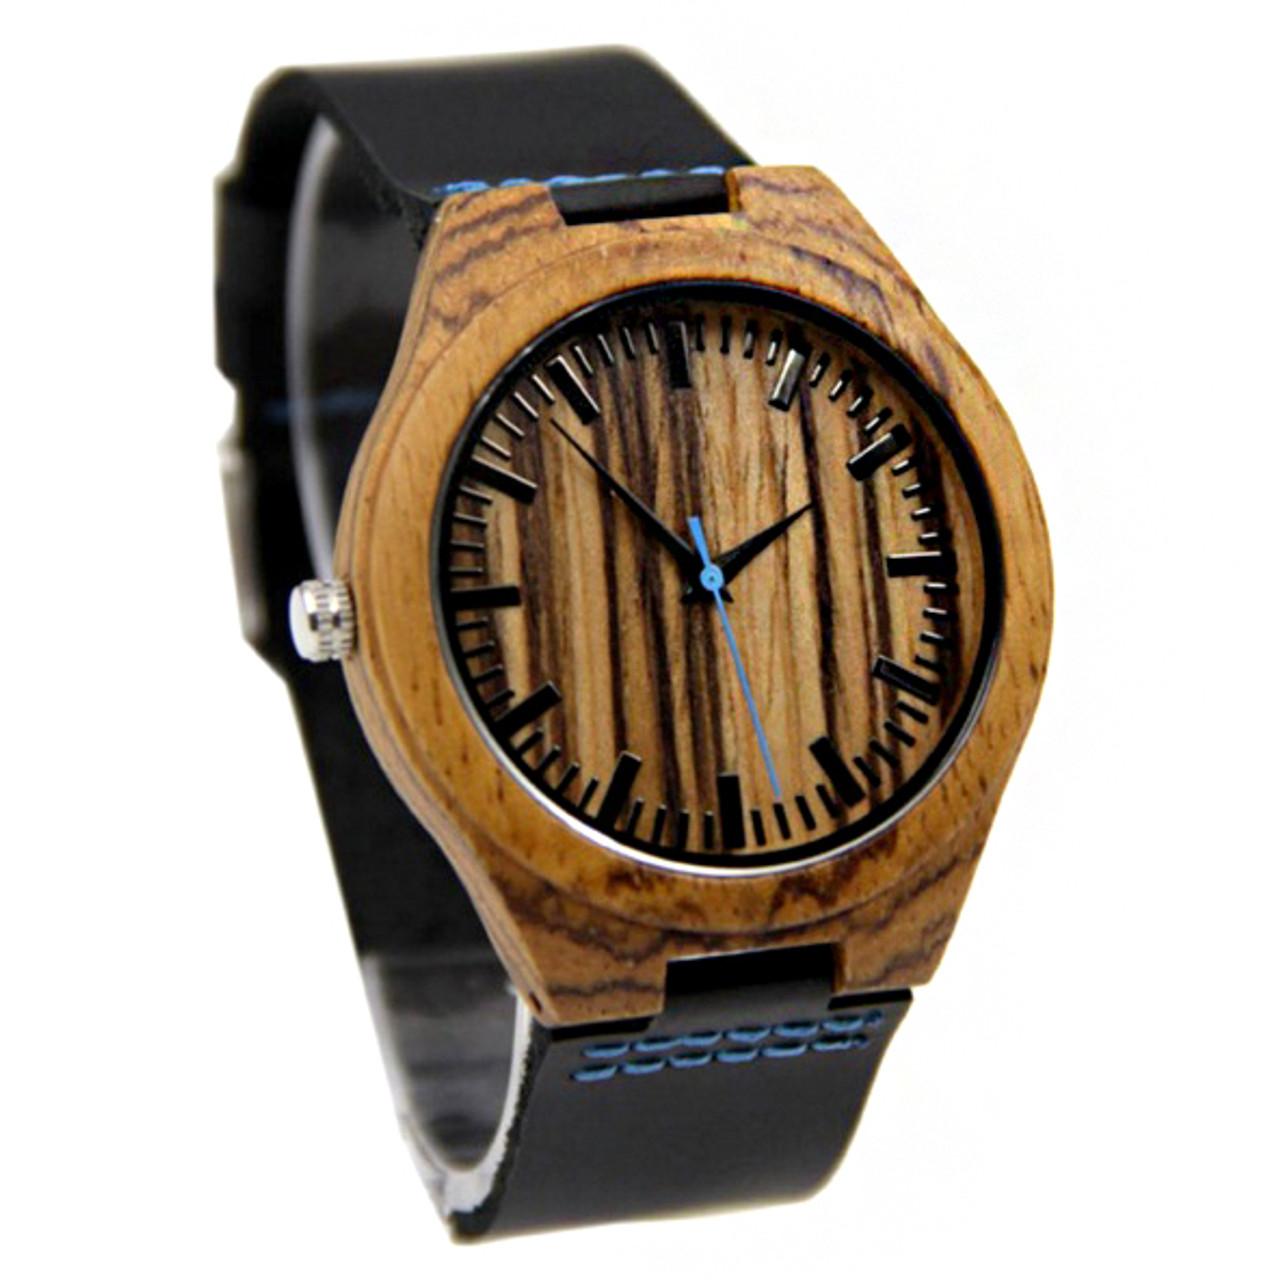 Grpn BE - Wood Engraved Watch W#70 - Ocean